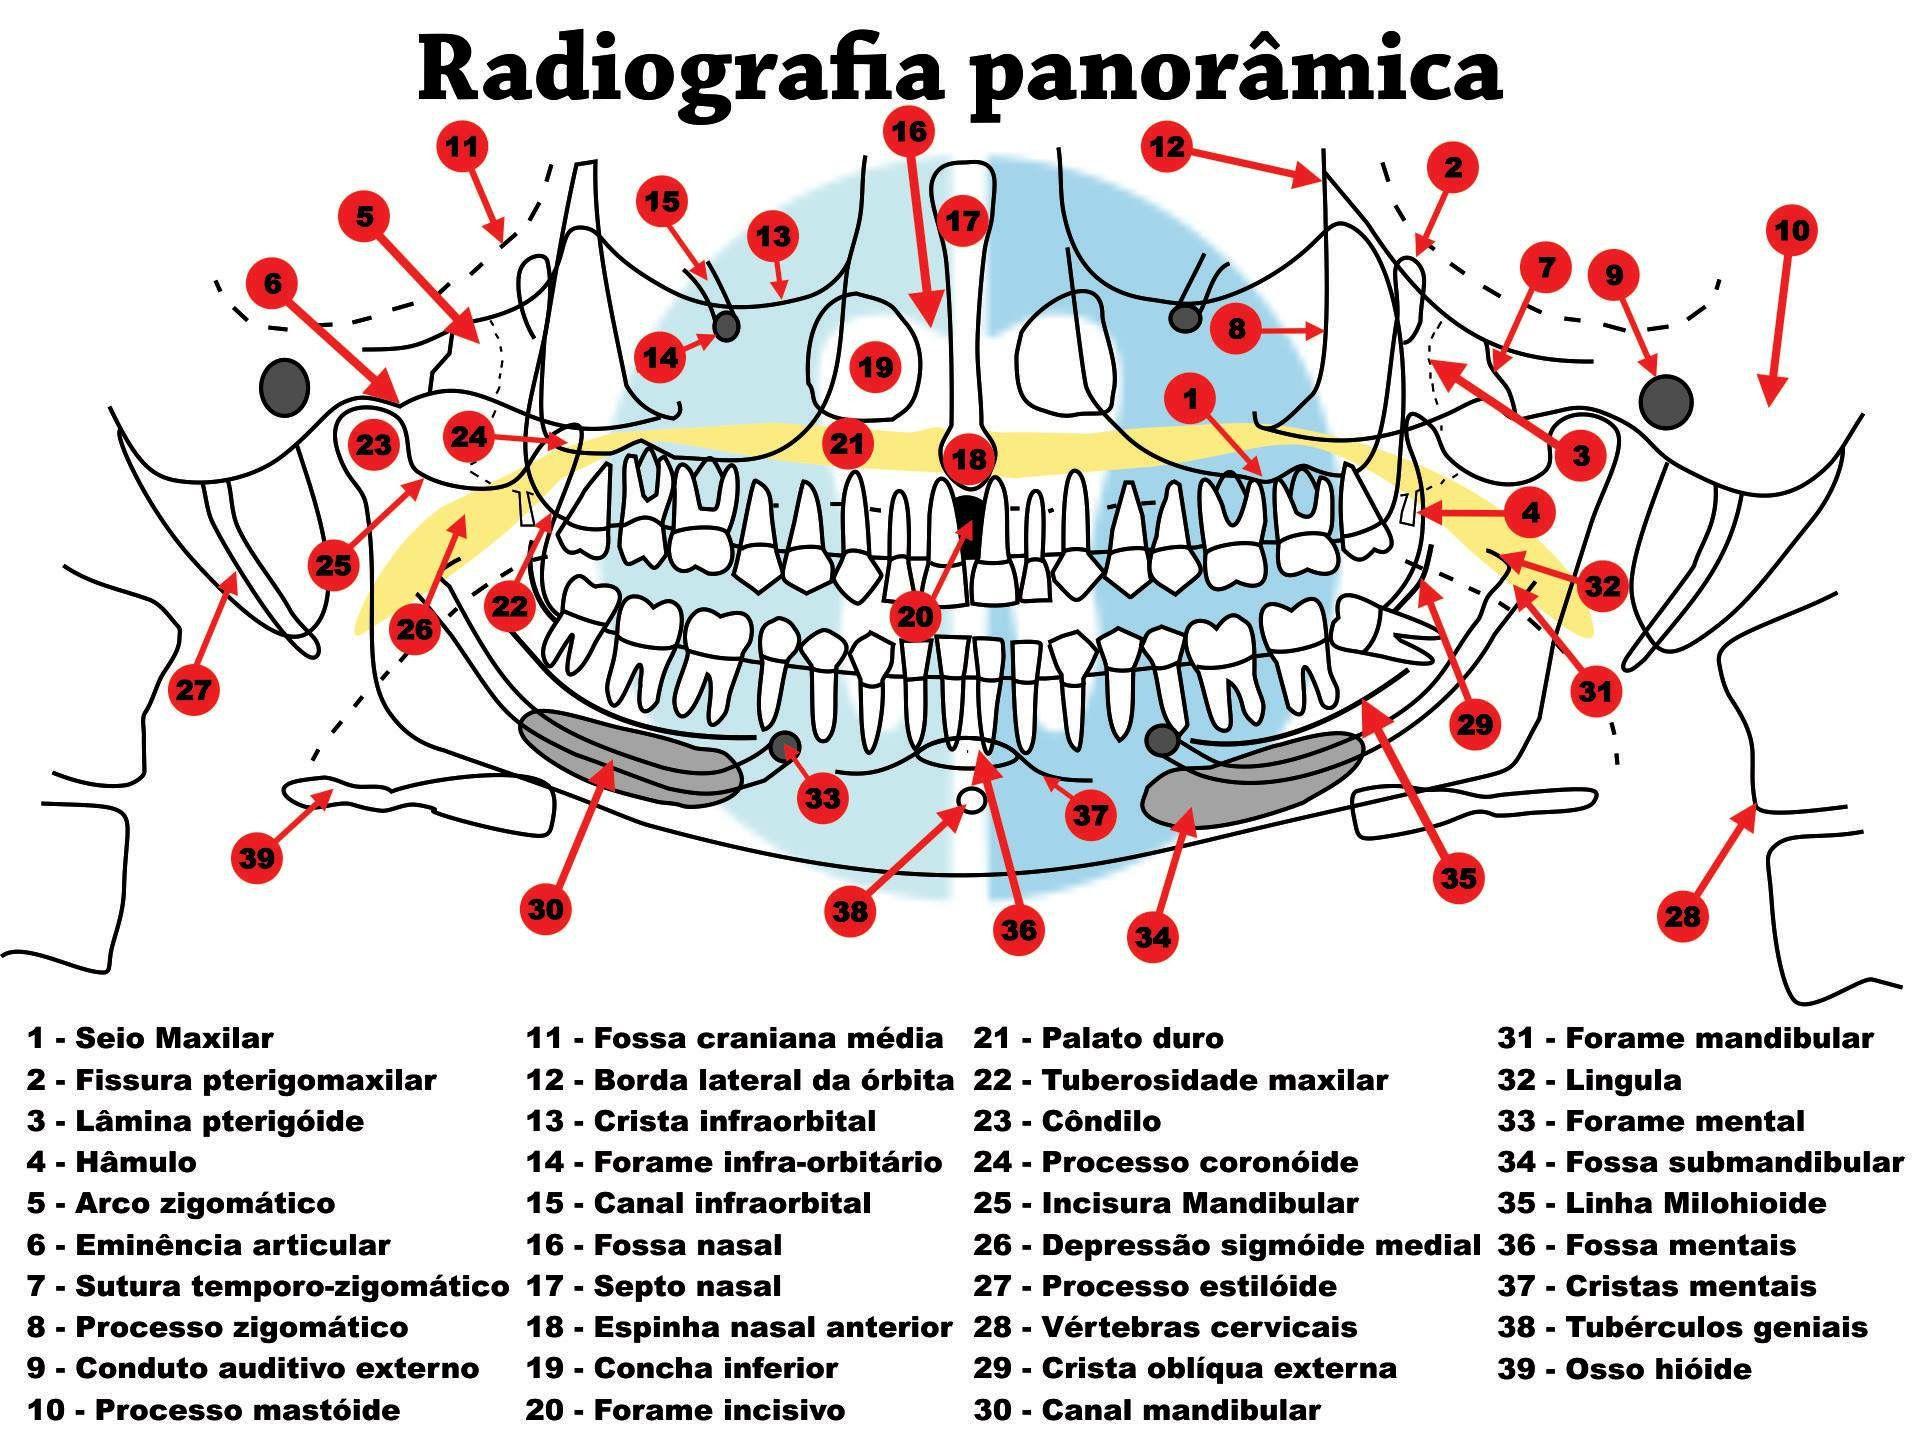 Anatomia em radiografia panorâmica